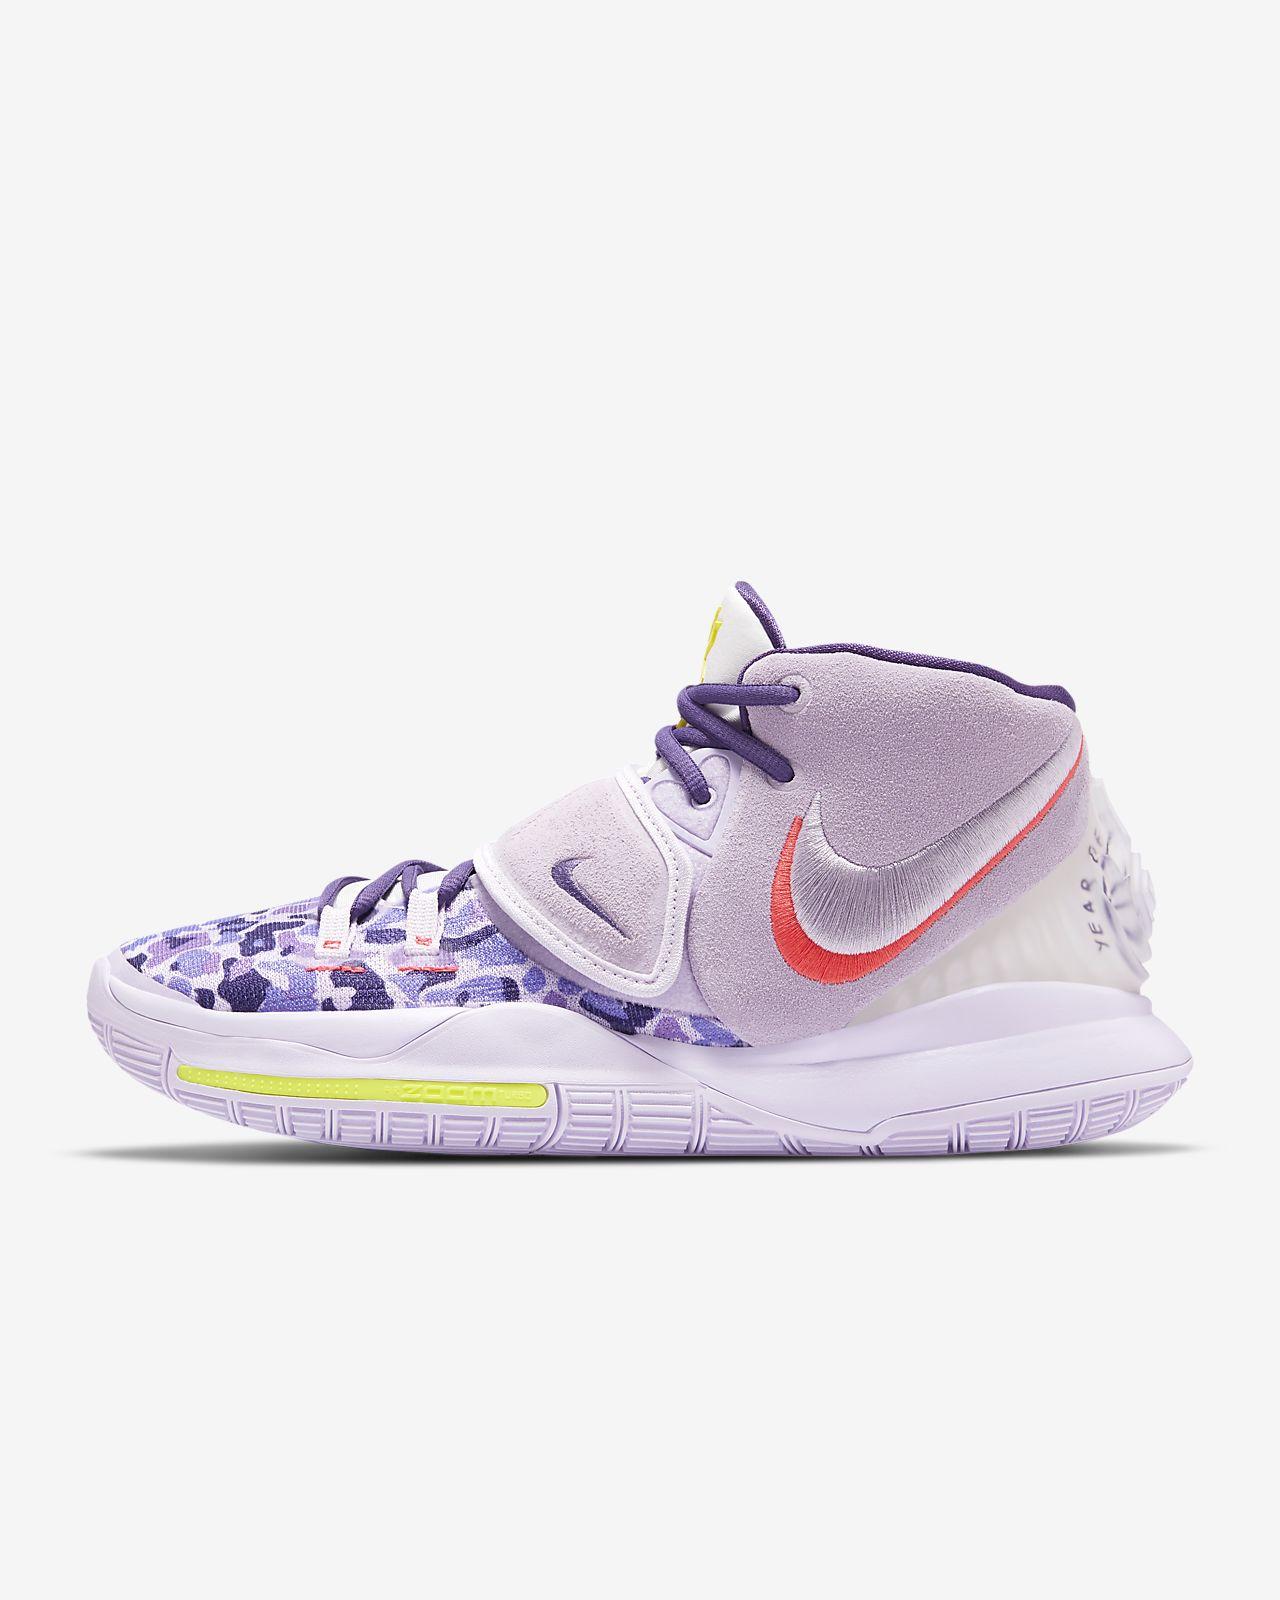 Kyrie 6 'Asia Irving' EP Basketball Shoe